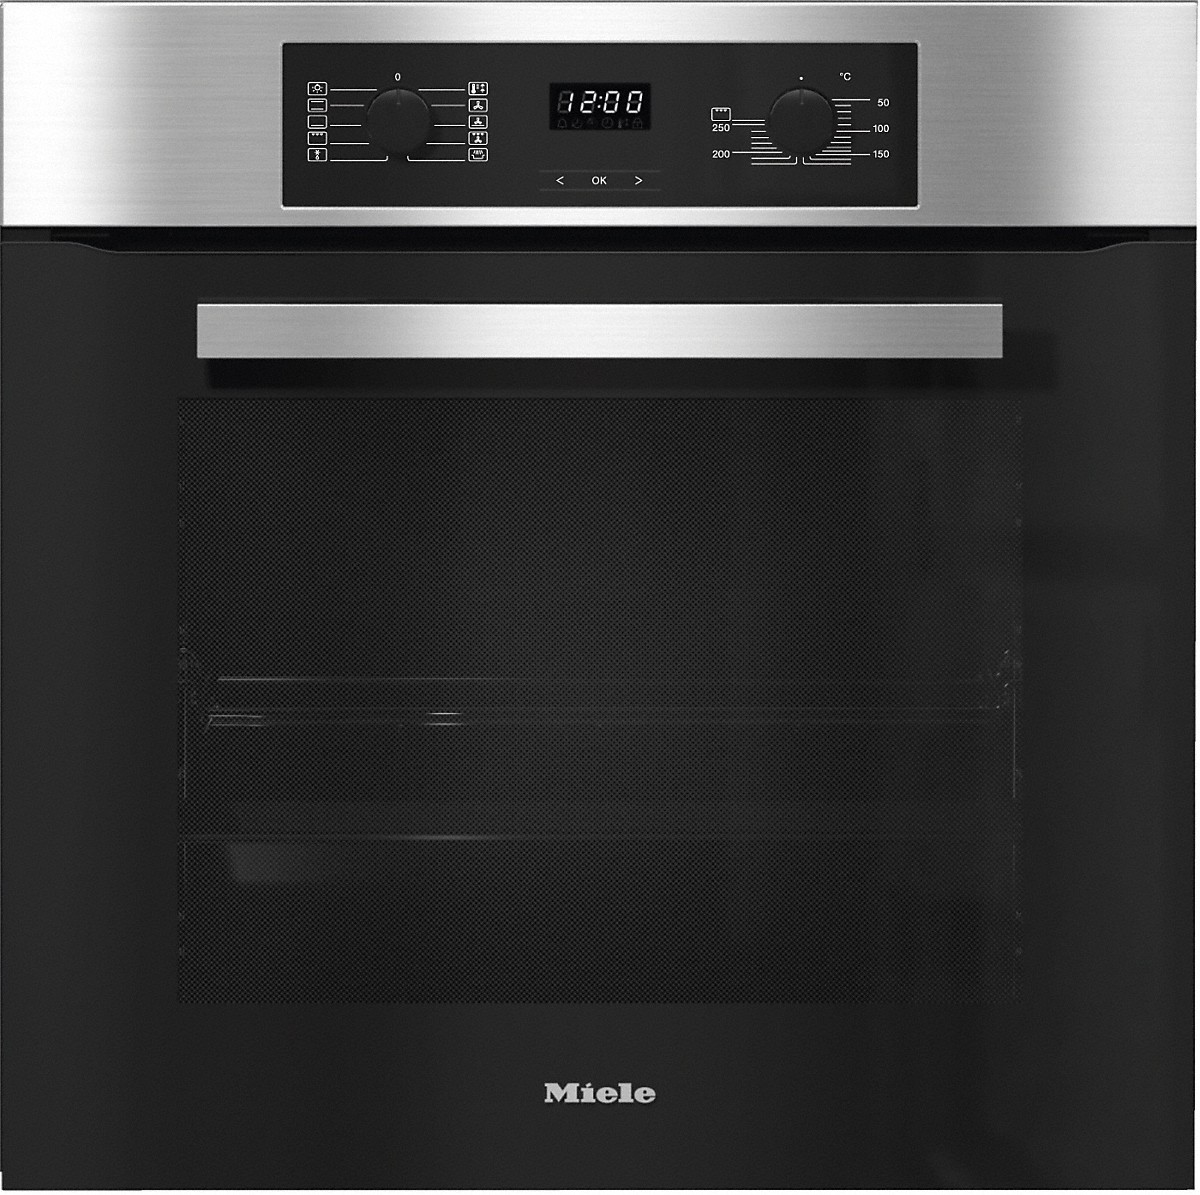 miele ovens h 2265 b active oven. Black Bedroom Furniture Sets. Home Design Ideas